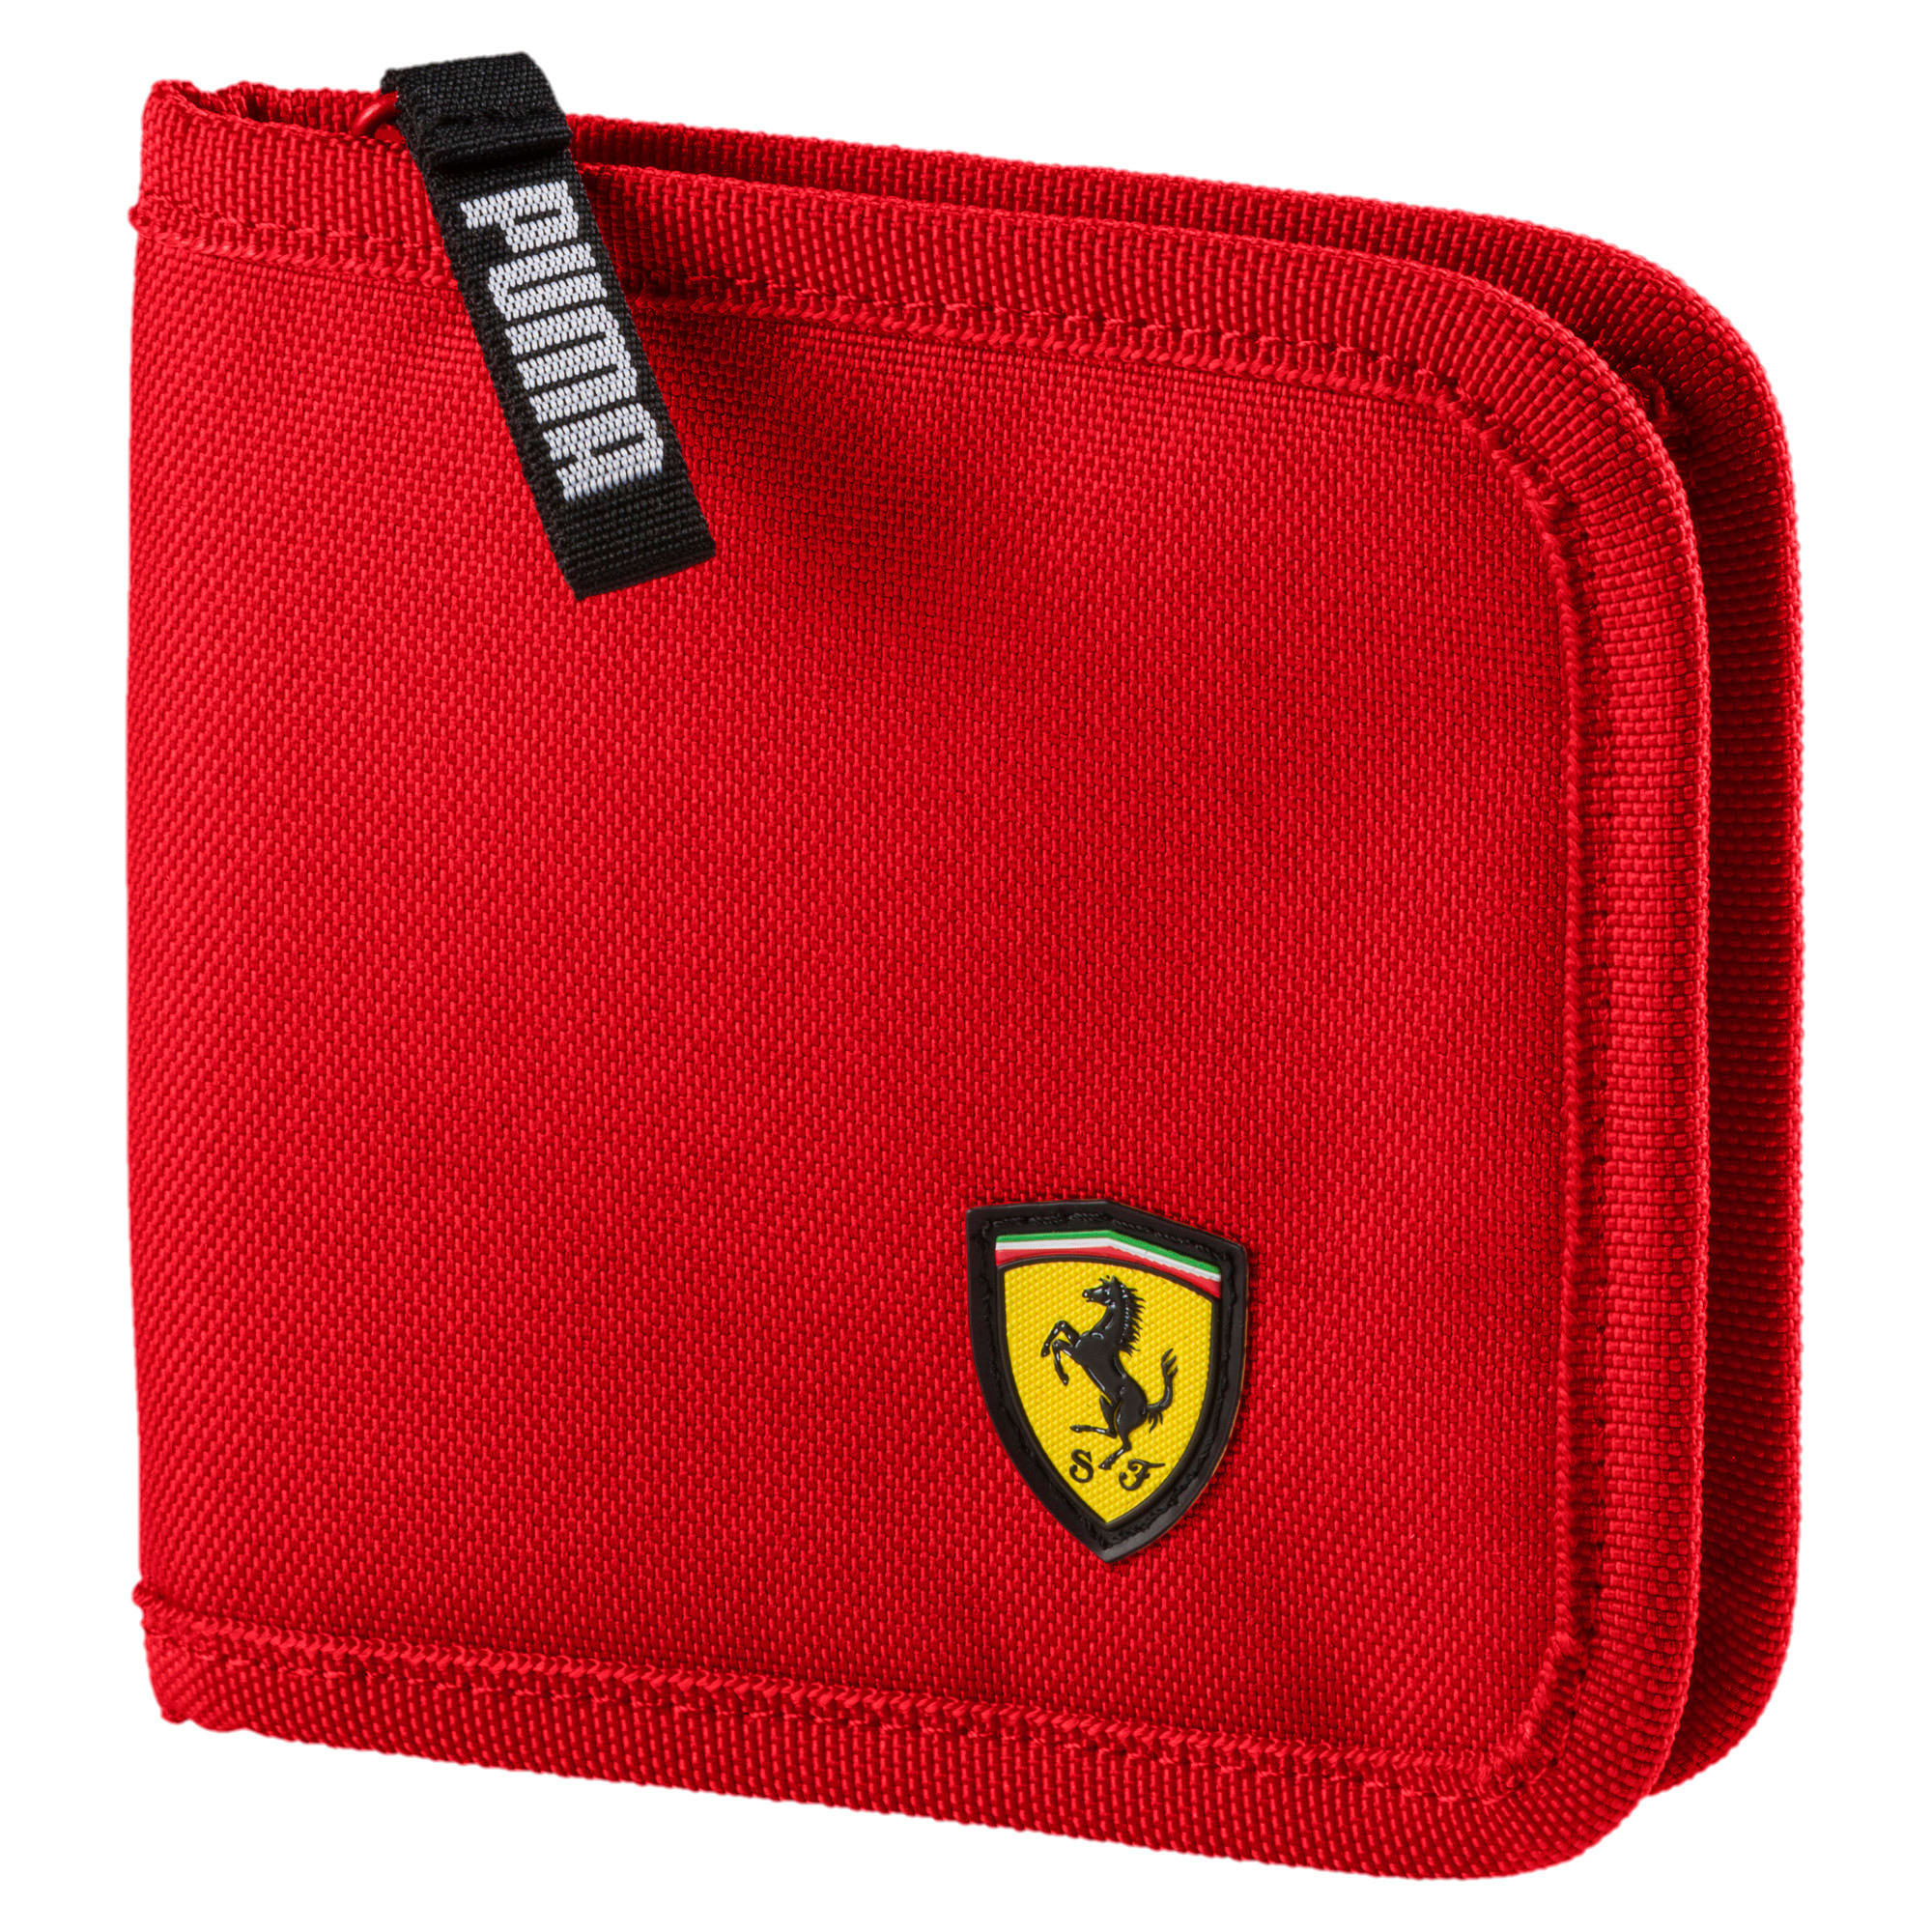 Thumbnail 1 of Scuderia Ferrari Fanwear Wallet, Rosso Corsa, medium